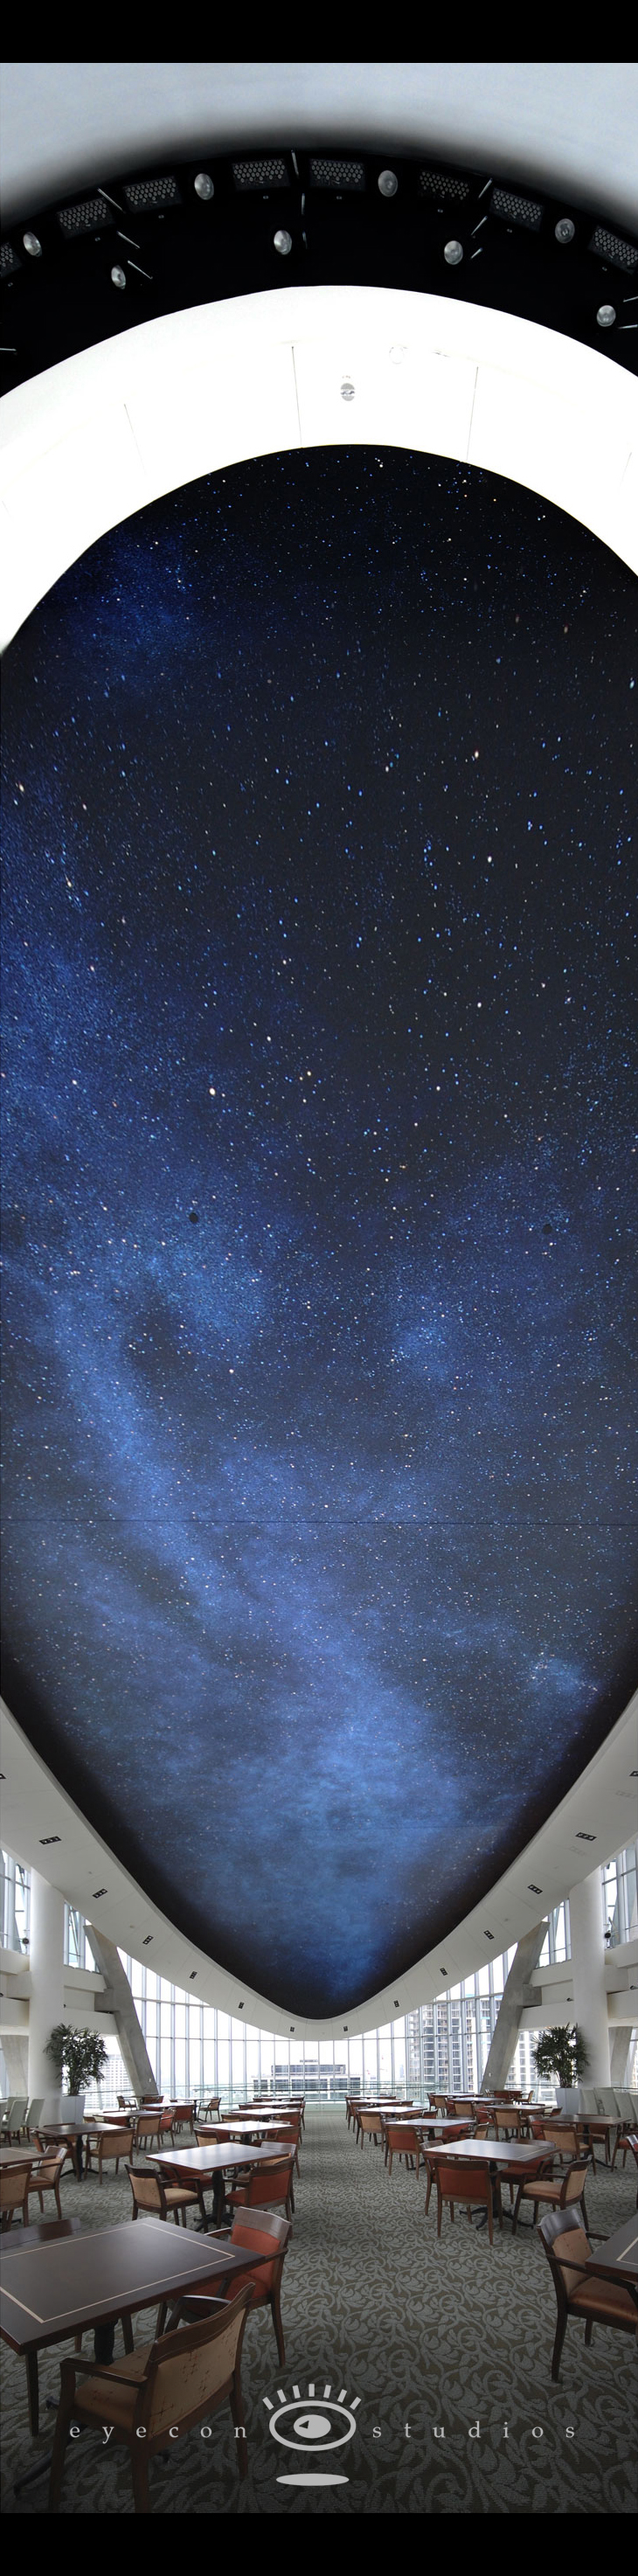 HUNT SKY BB1.jpg